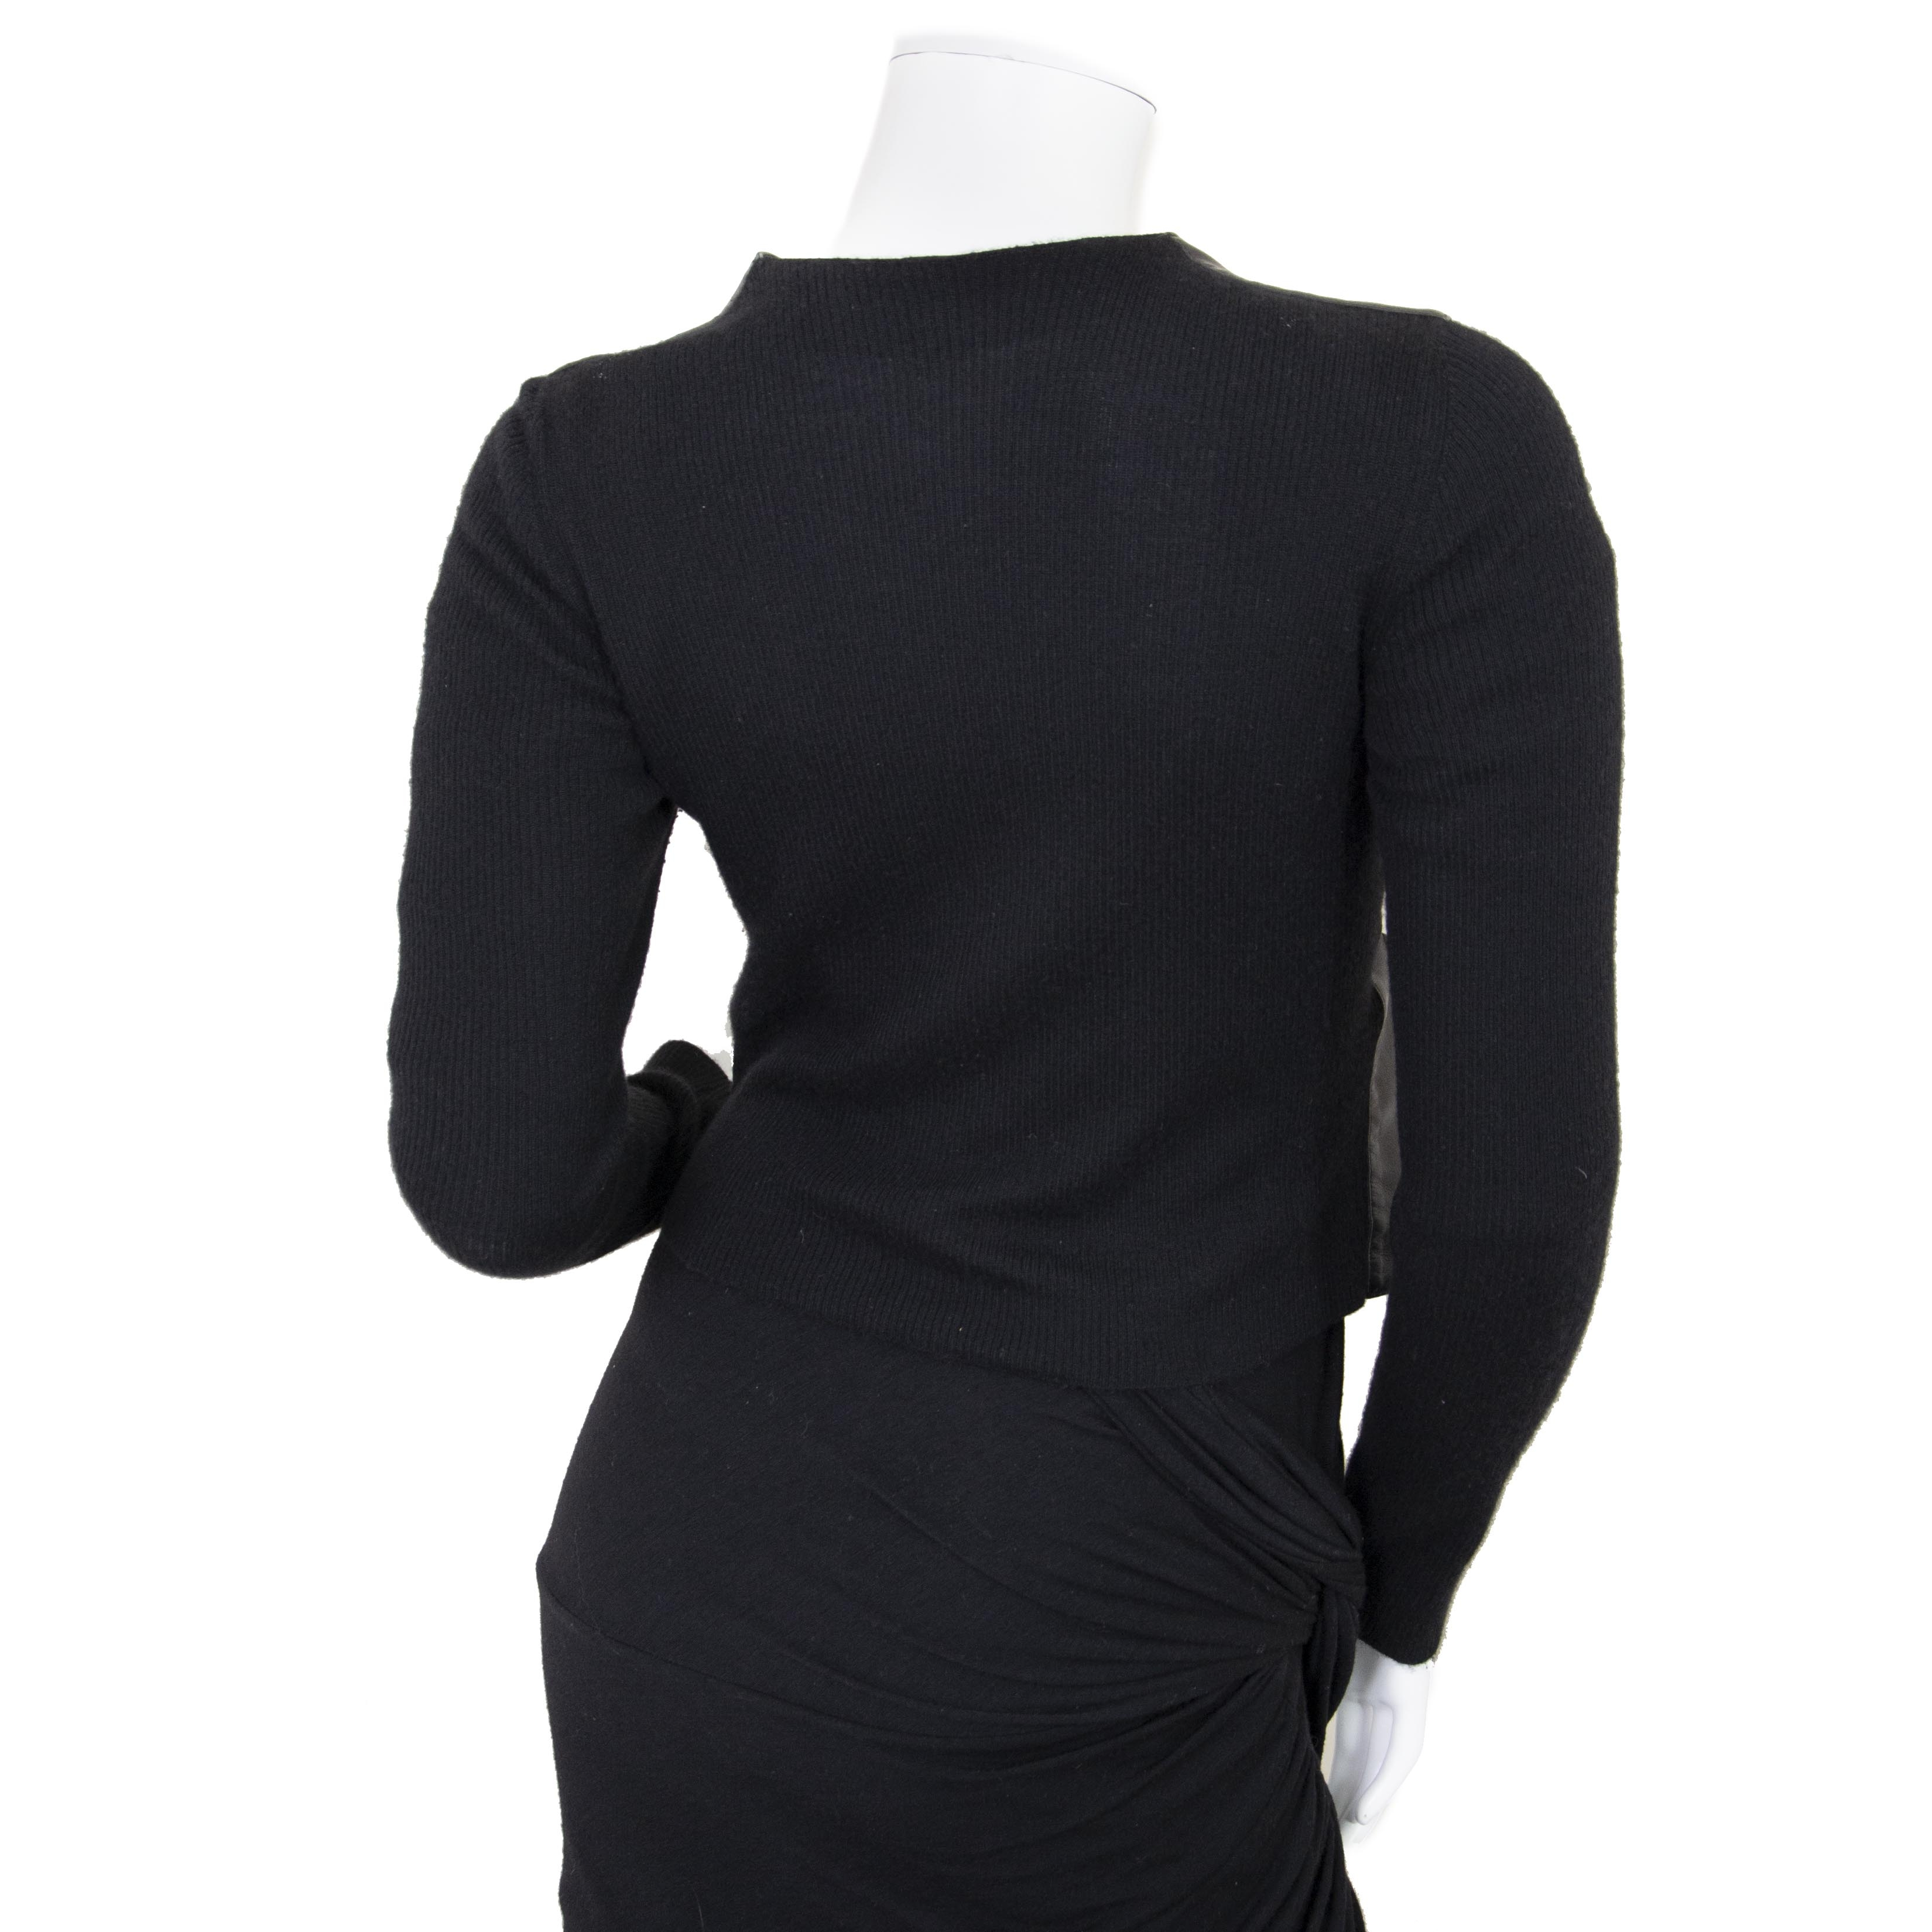 Authentiek Gucci Black Leather and Fabric Shirt - size 40 juiste prijs veilig online winkelen